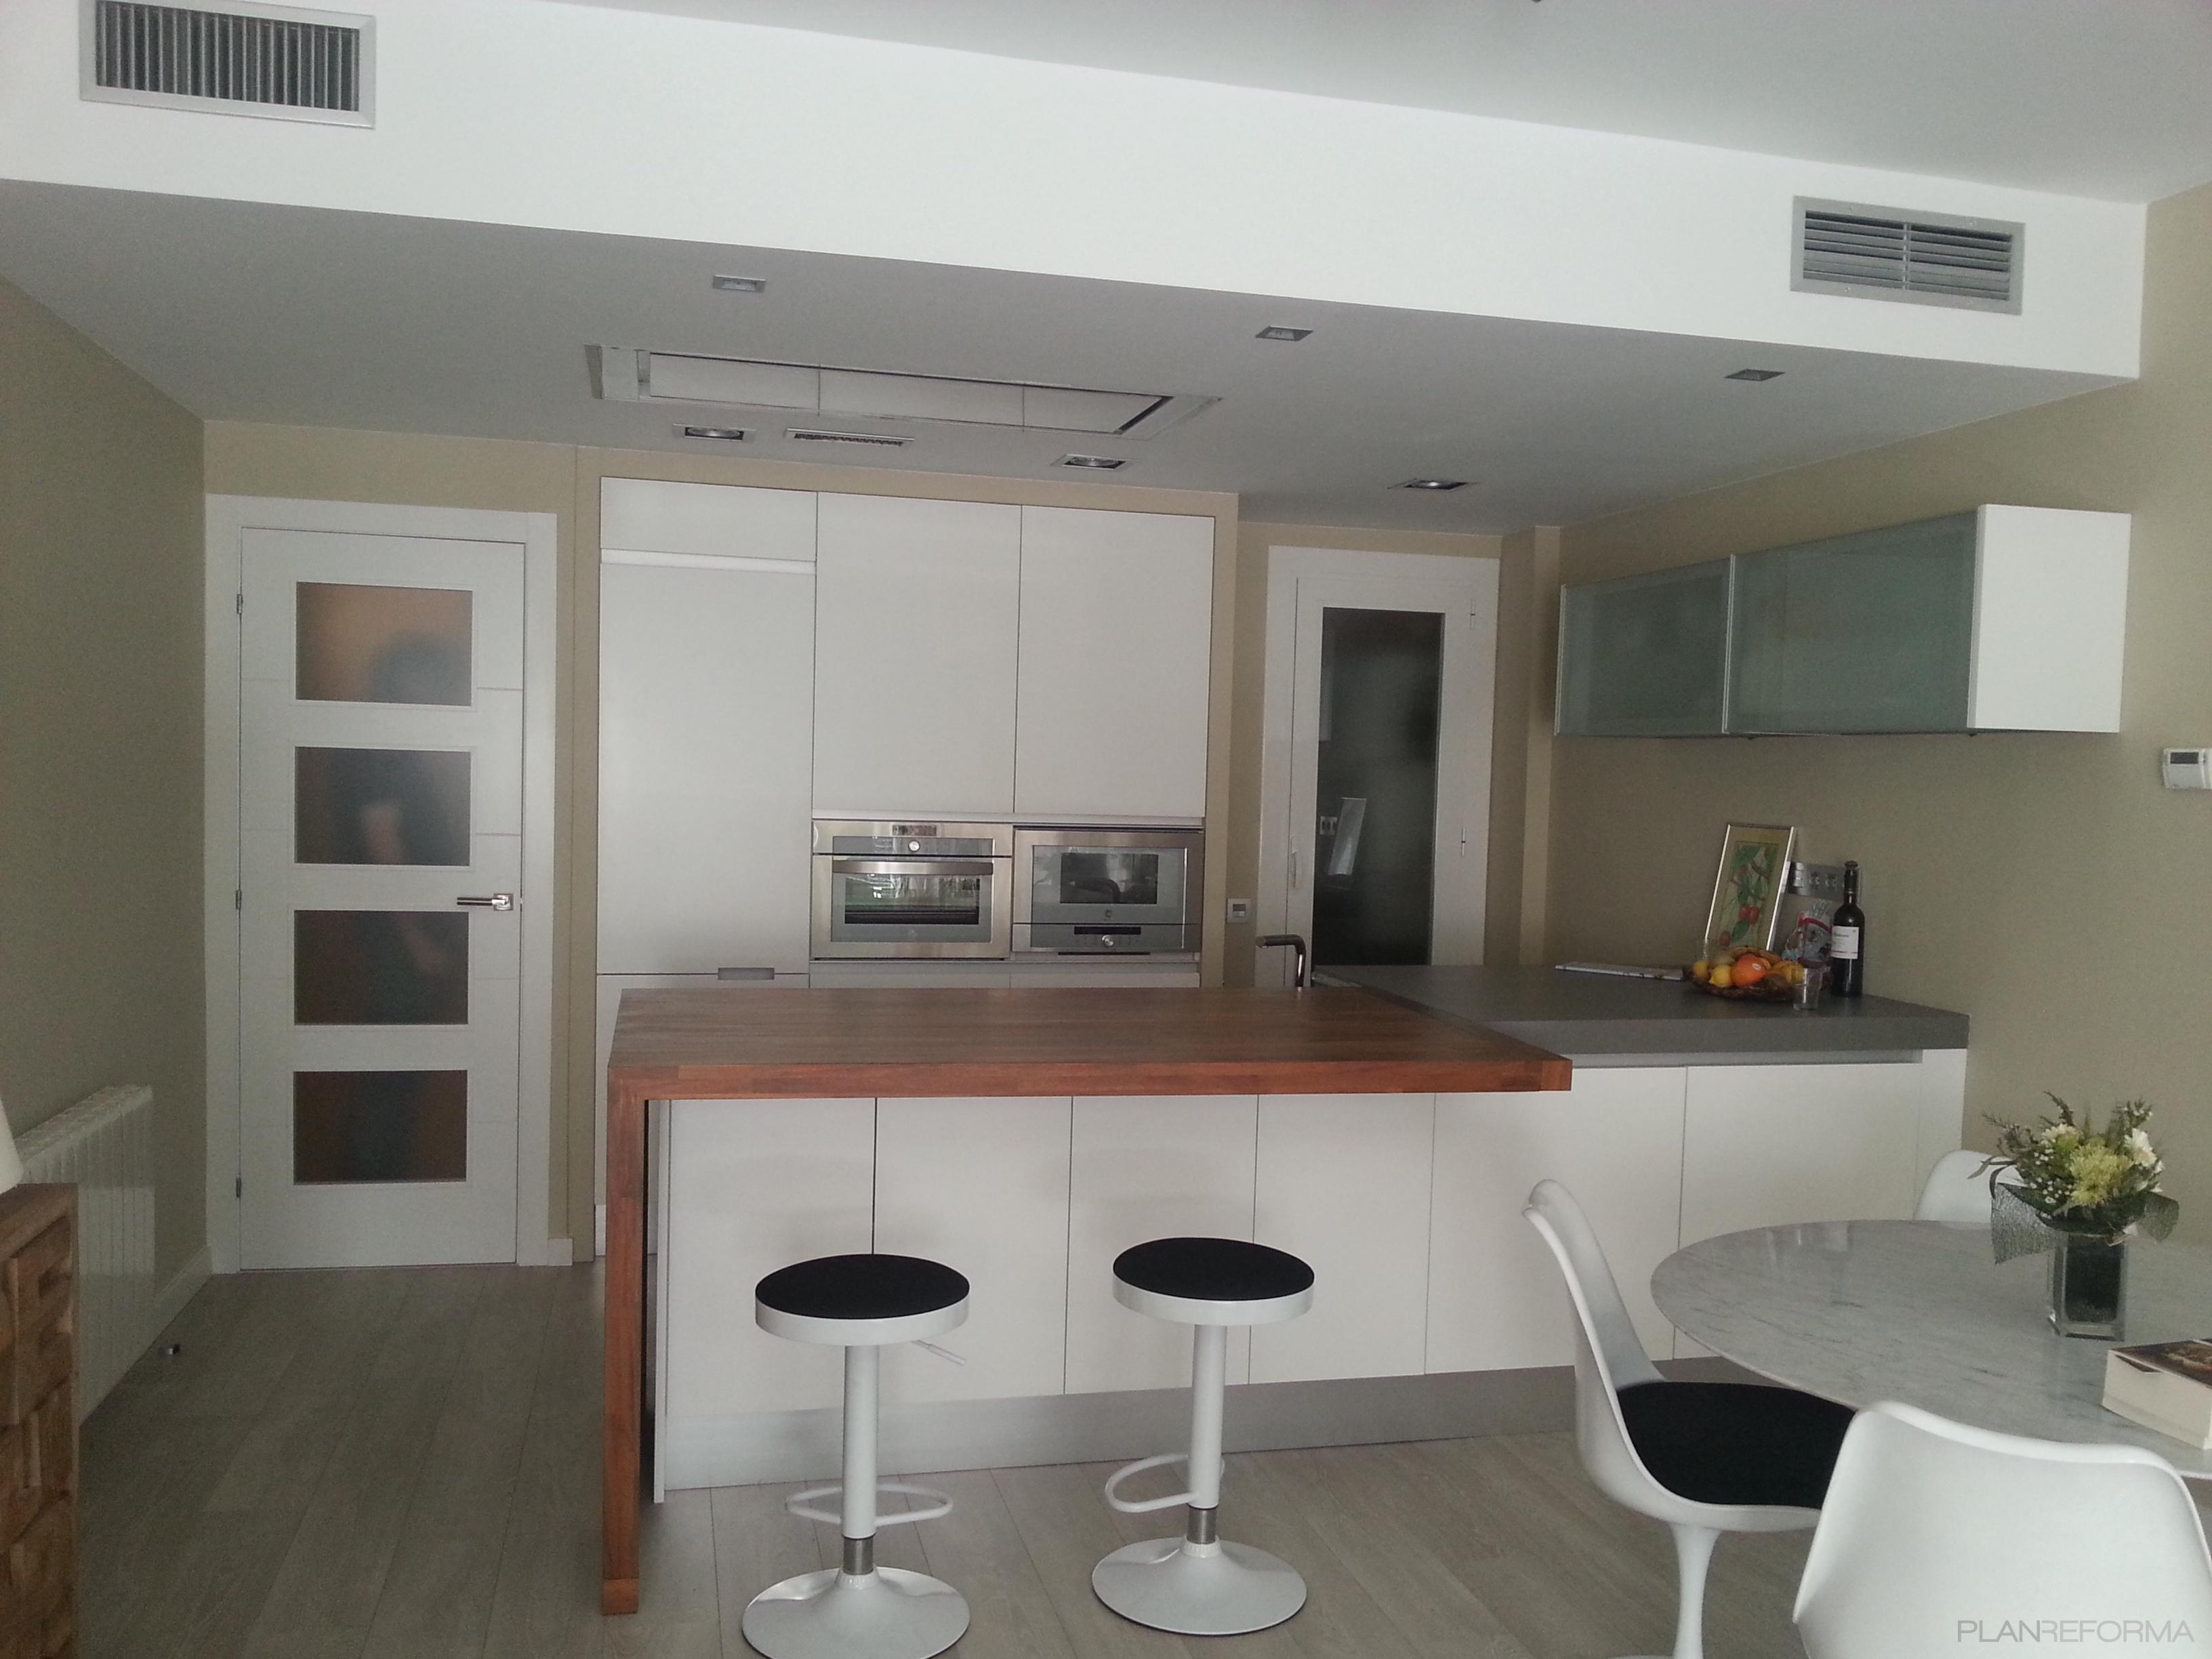 Comedor cocina style moderno color beige marron blanco - Cocina comedor ideas ...